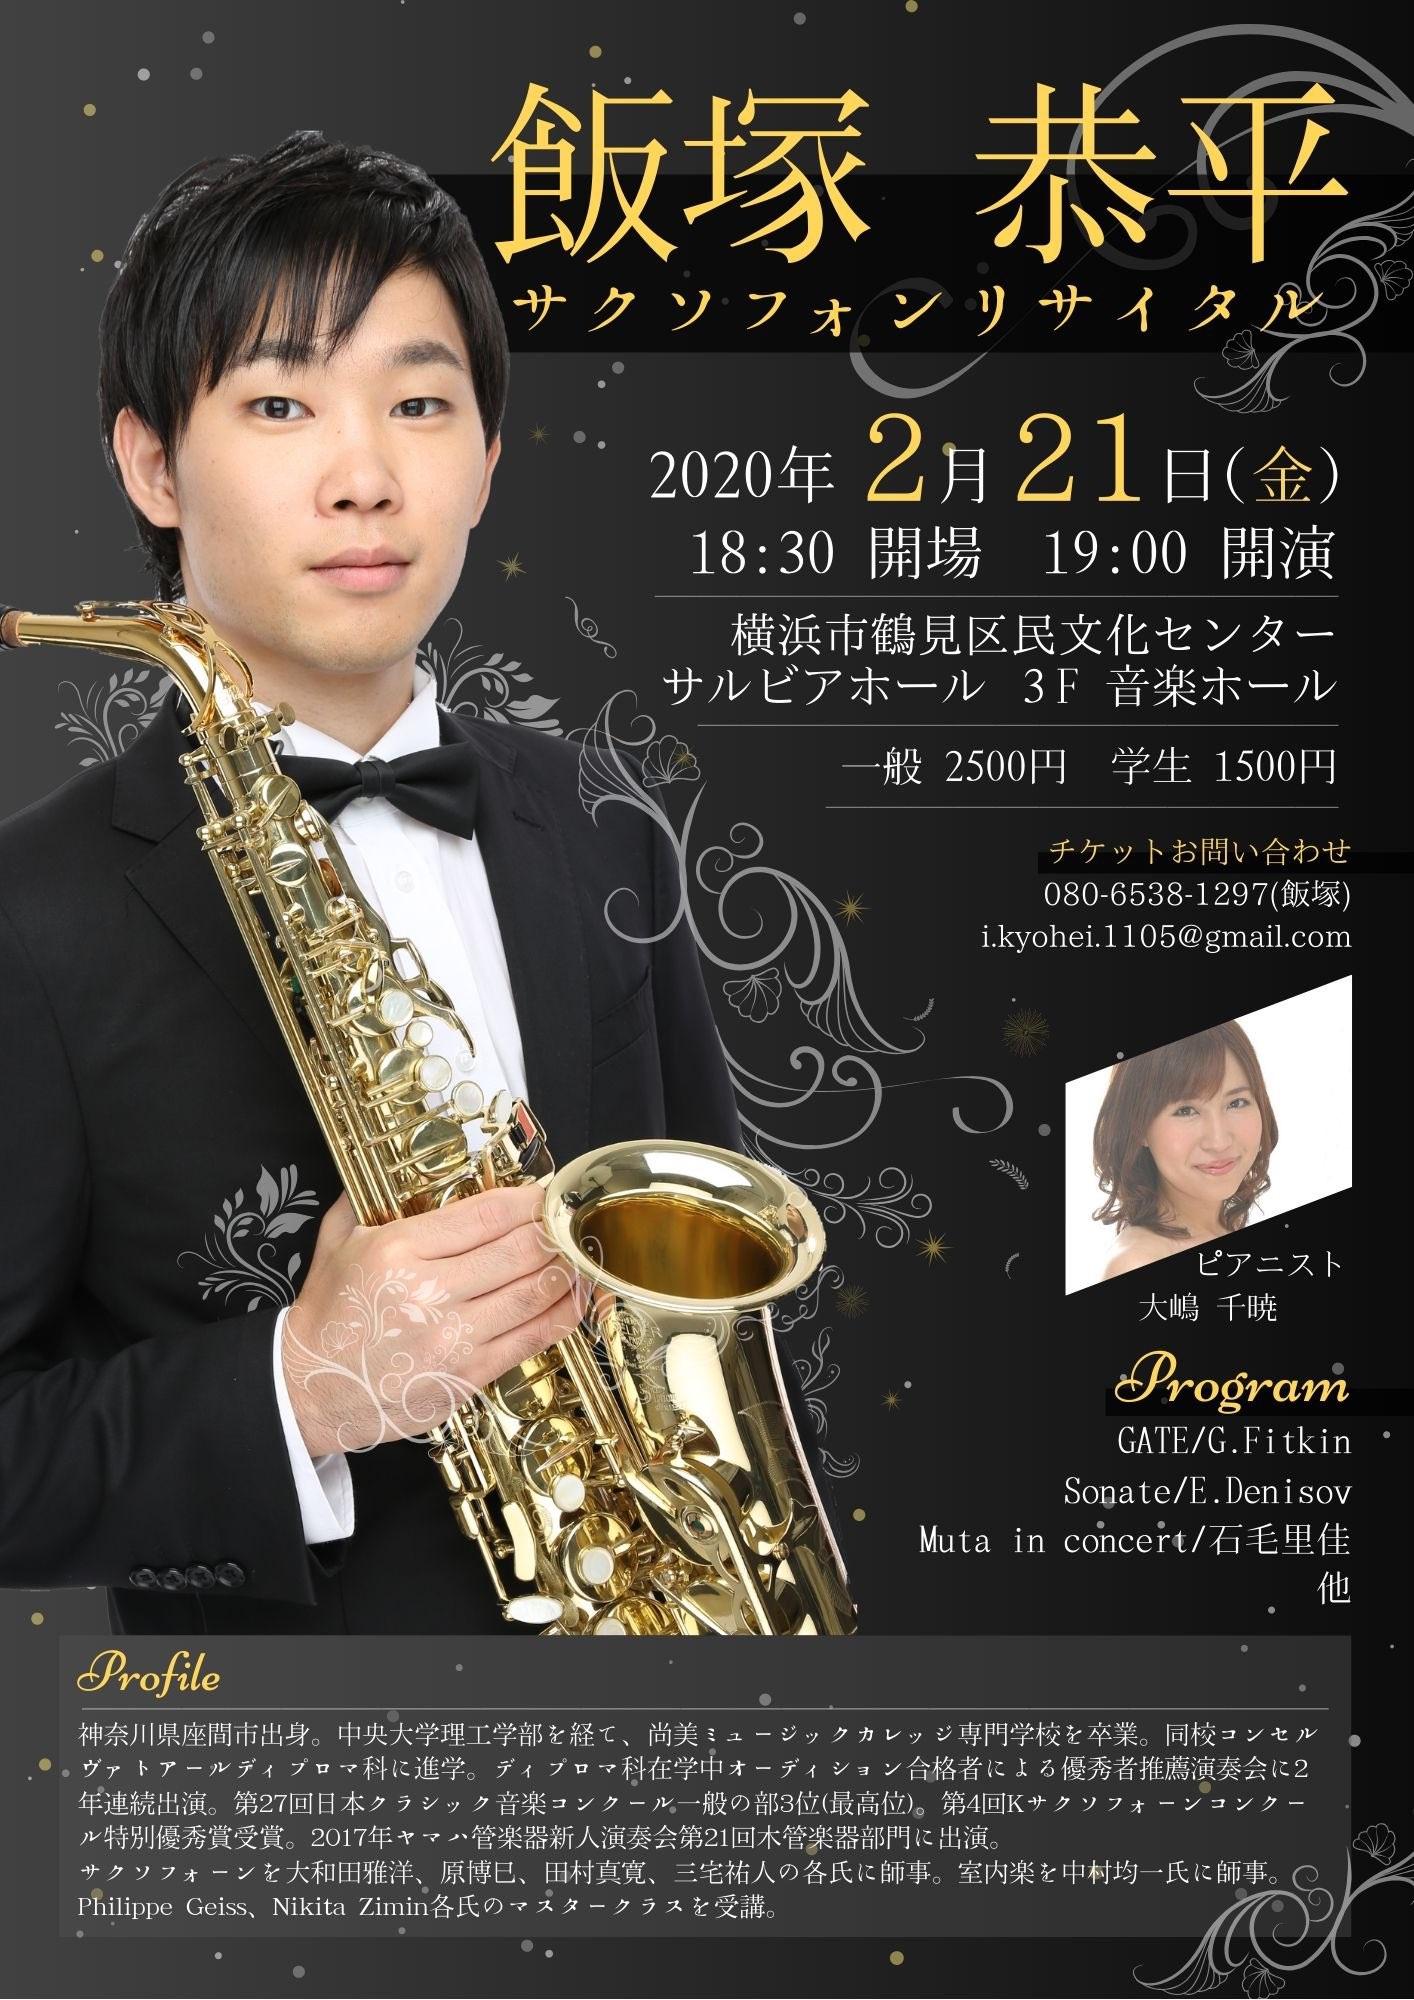 f:id:watson-saxophone0408:20200210140321j:image